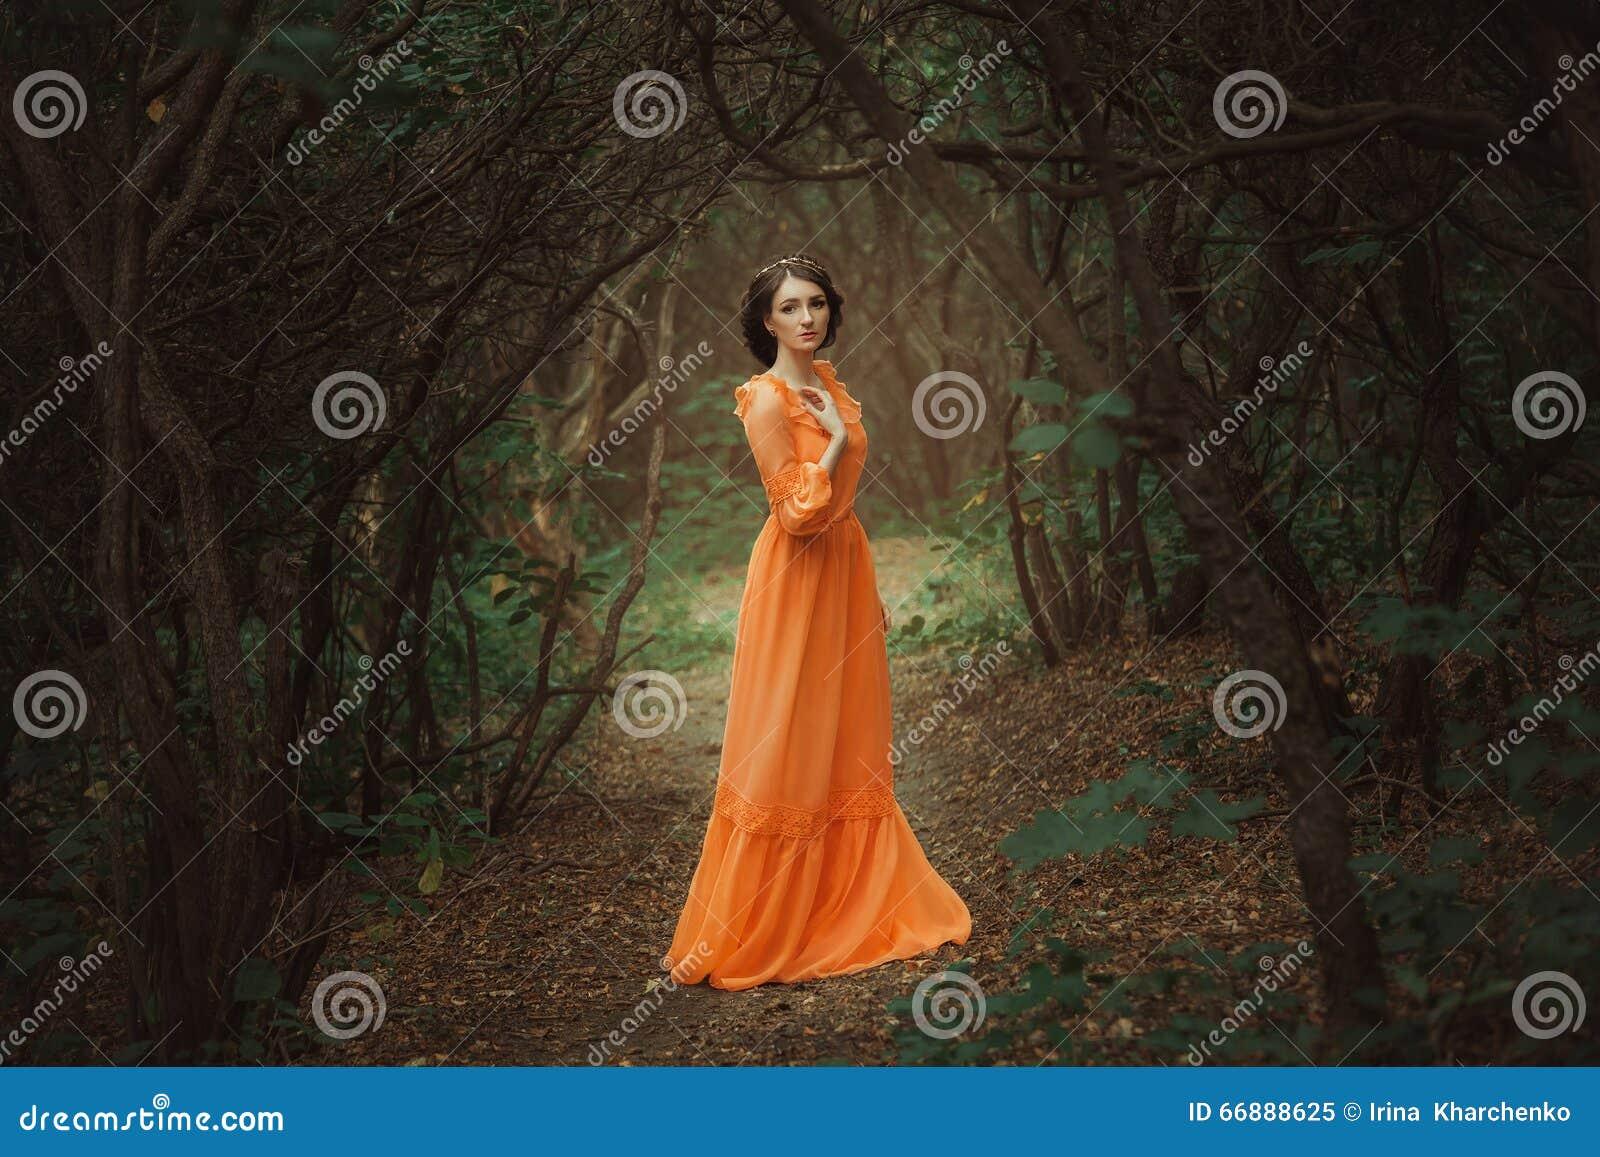 The beautiful countess in a long orange dress